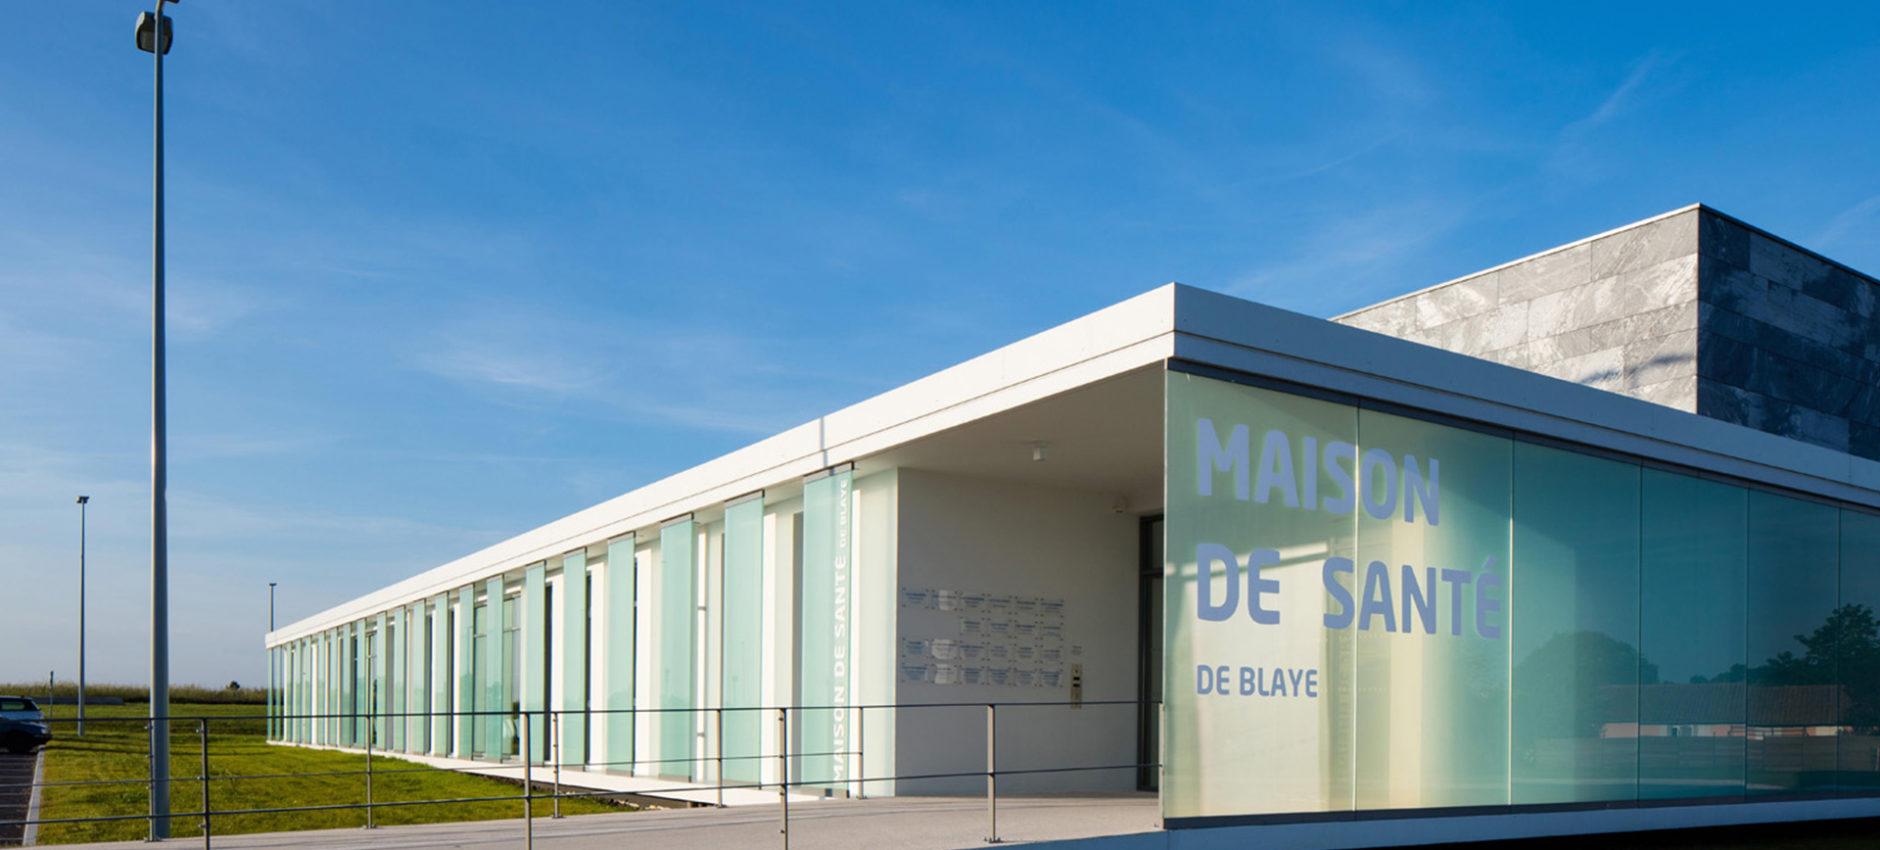 boca_architecture_projet_maison_sante_blaye_01.jpg